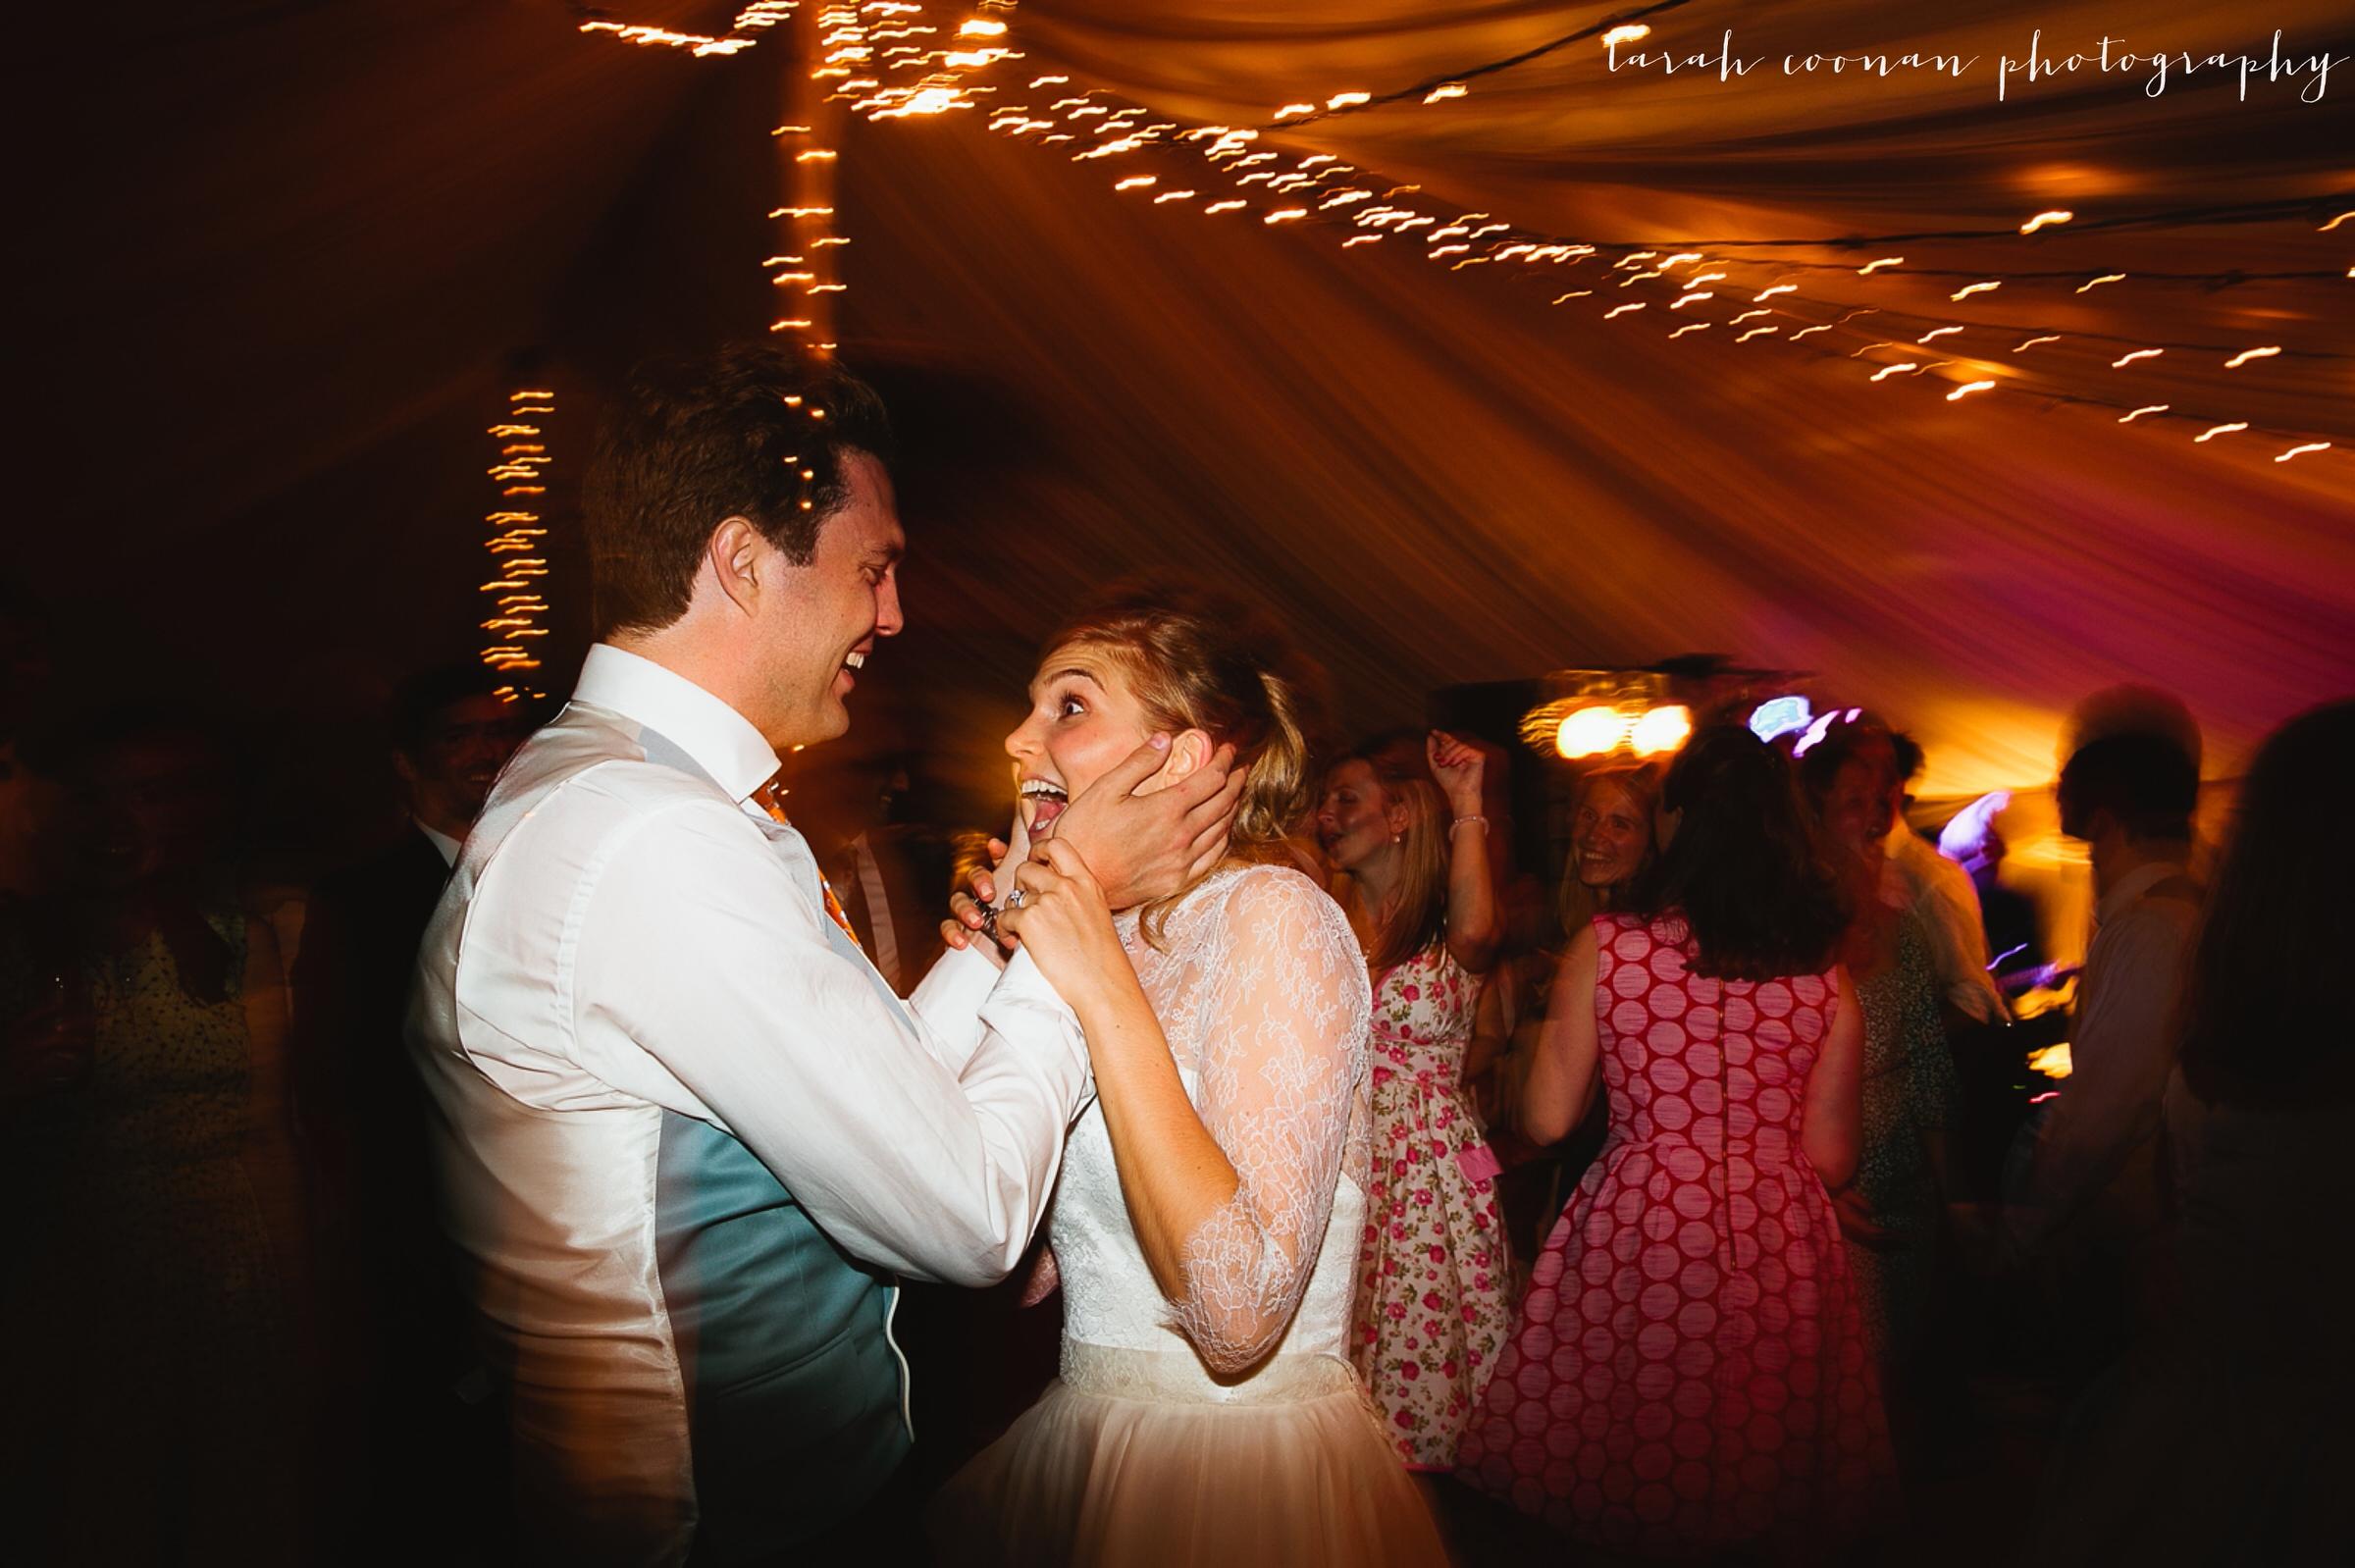 brighton-wedding-photographer123